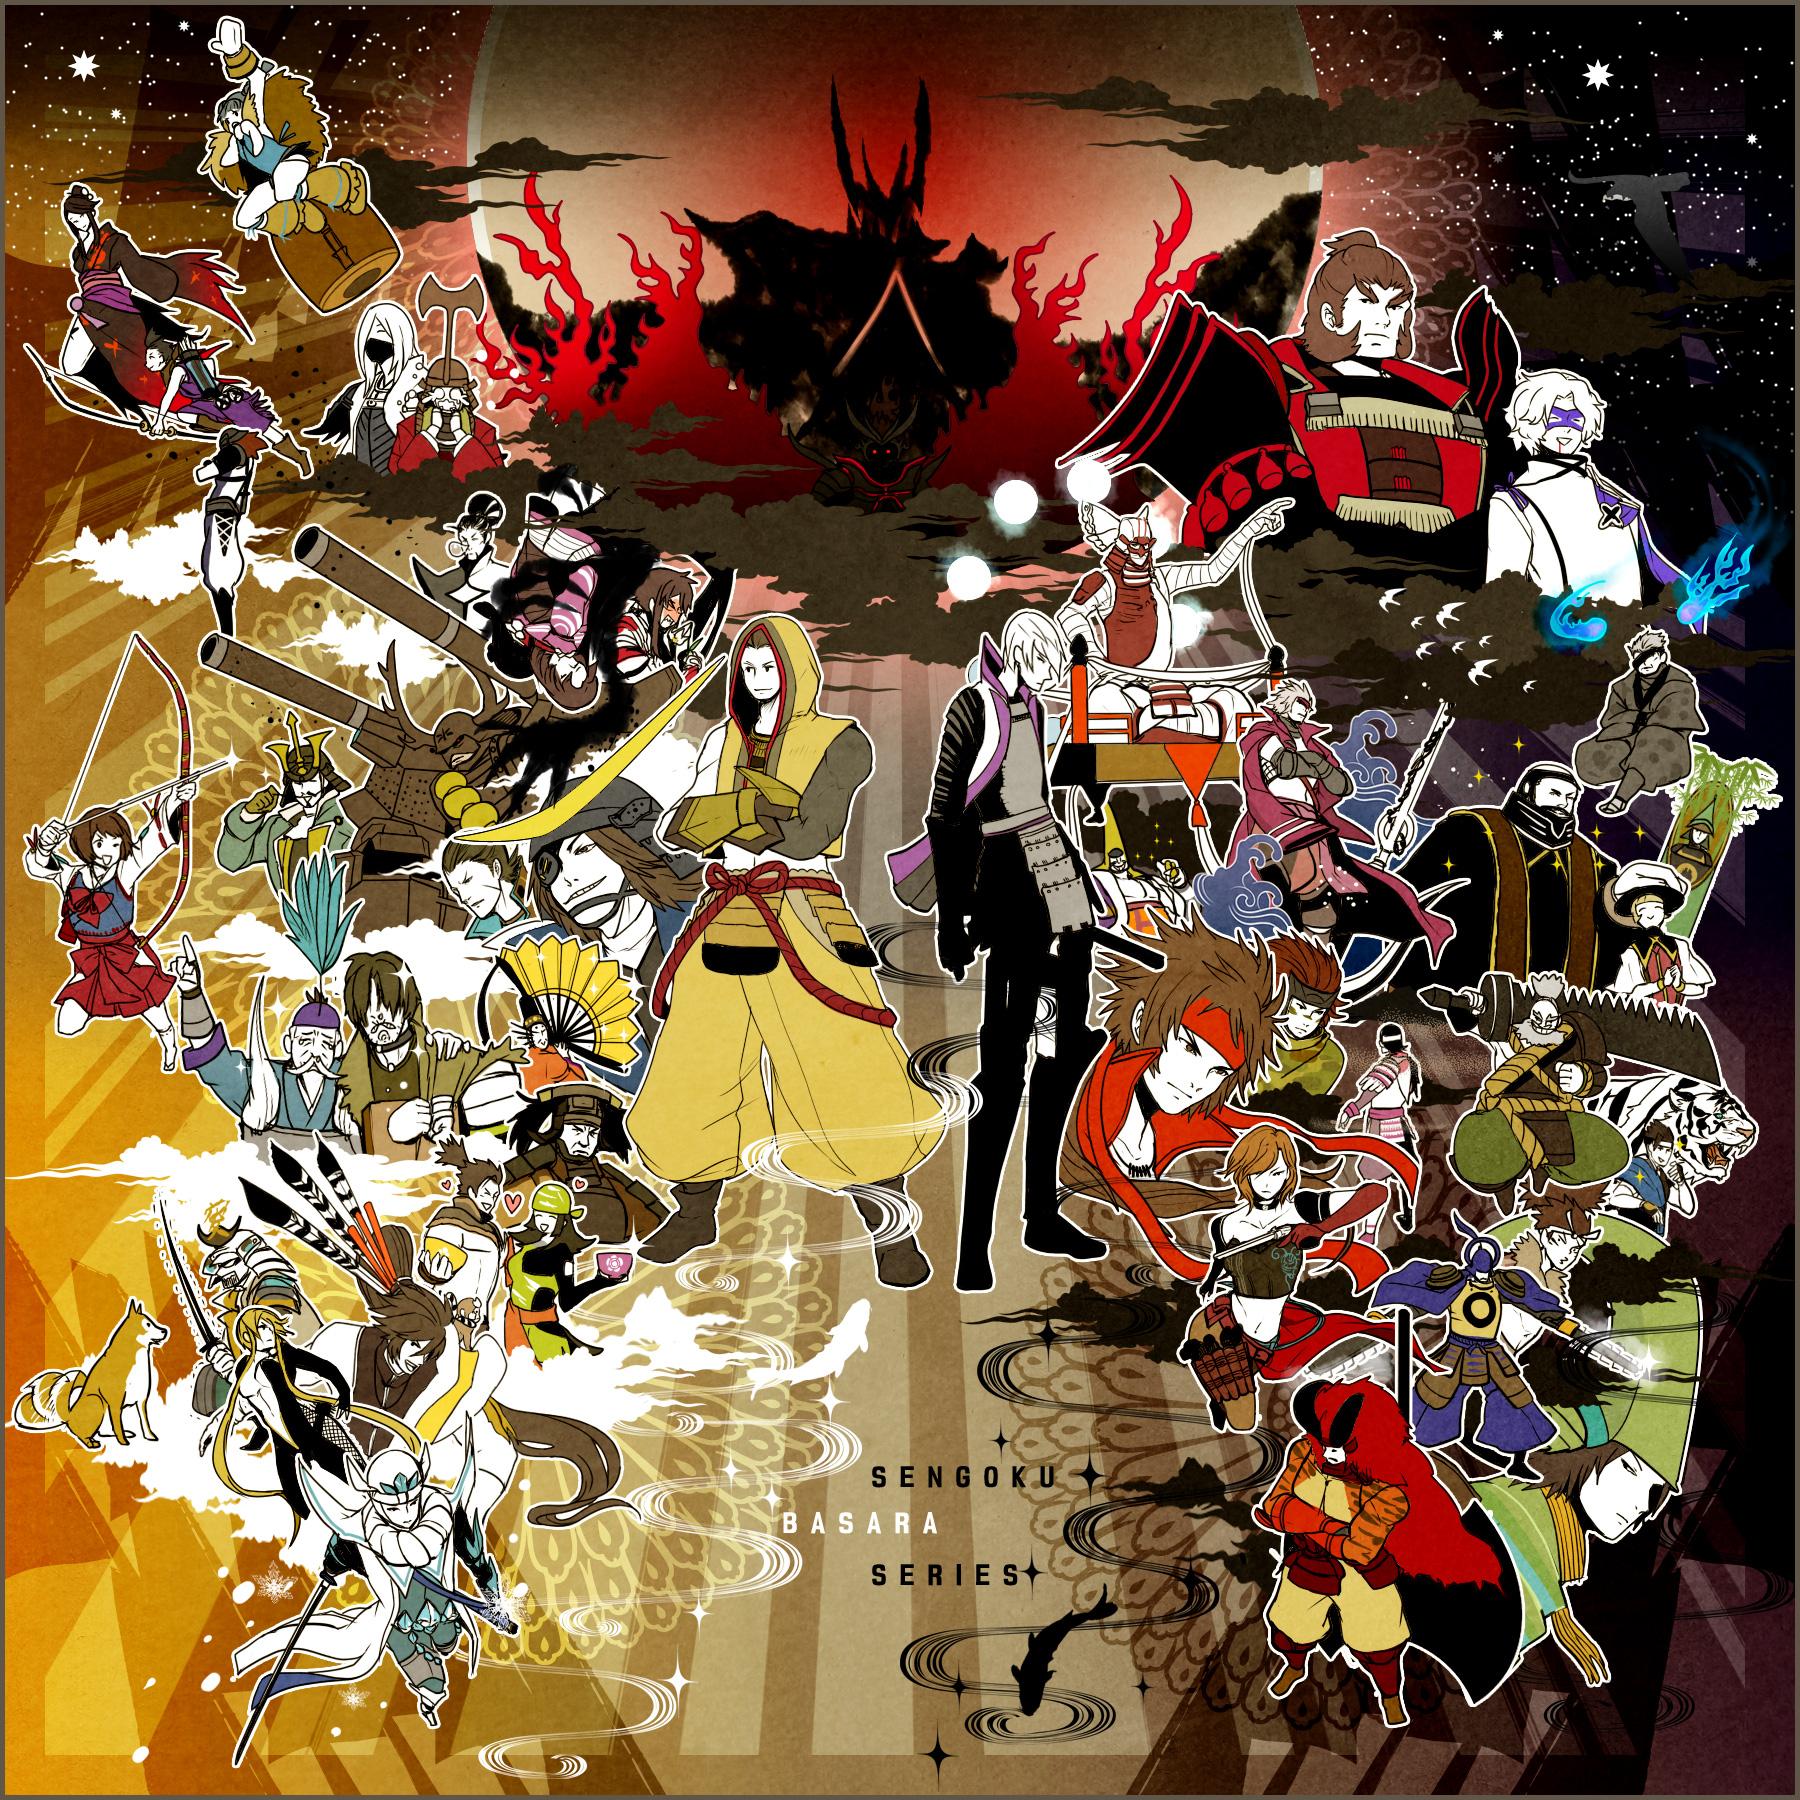 Download Anime Basara: Uesugi Kenshin (Sengoku Basara)